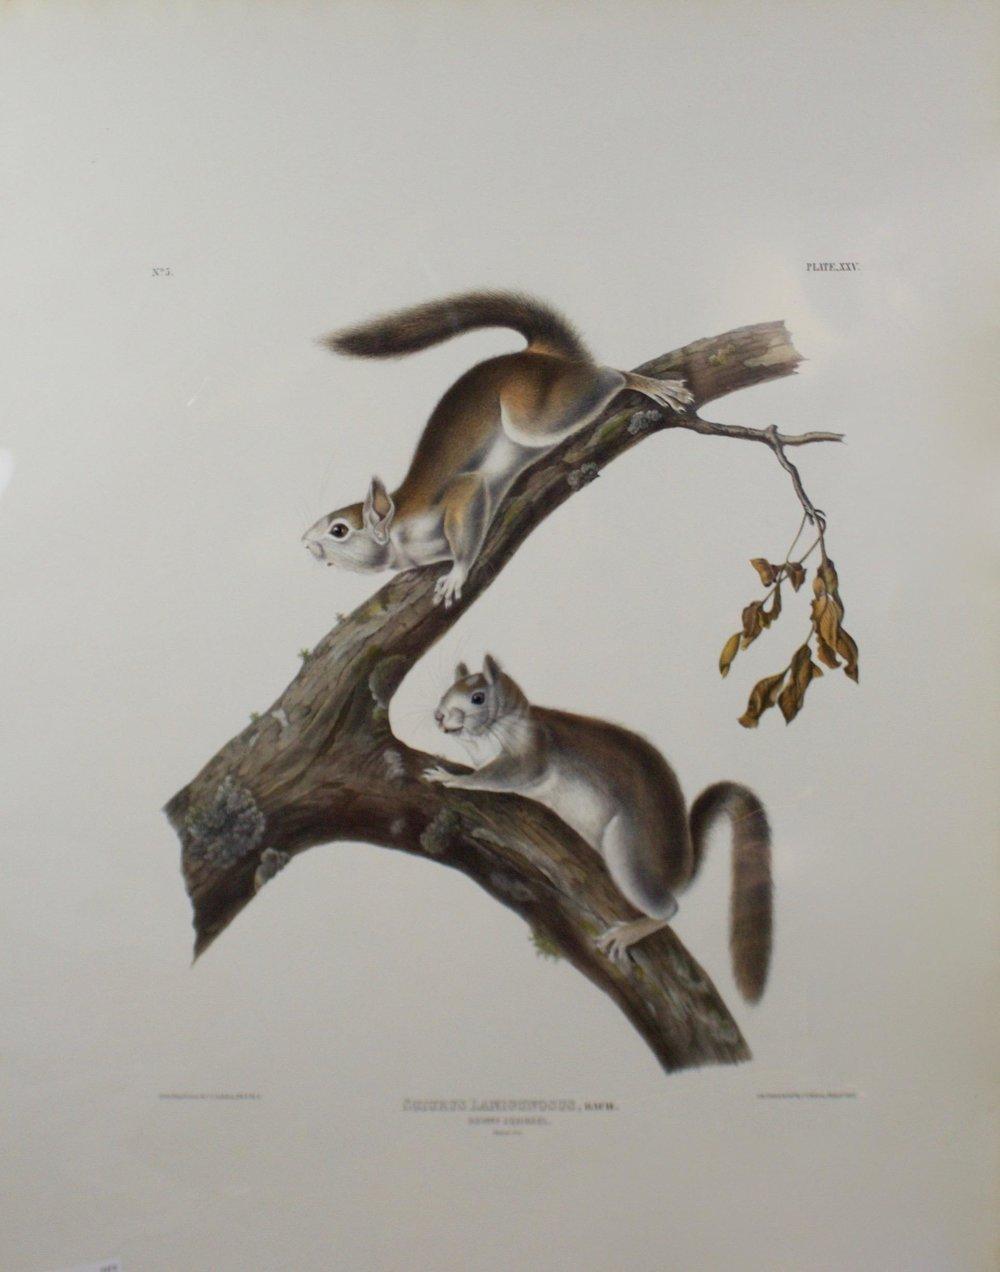 John James Audubon     Downy Squirrel - Sciurus Lanigunosus, Bach.   Plate 25 - Plate XXV  Lith Printed & Coll. J.T. Bowen, Phila., 1843  CJO0003